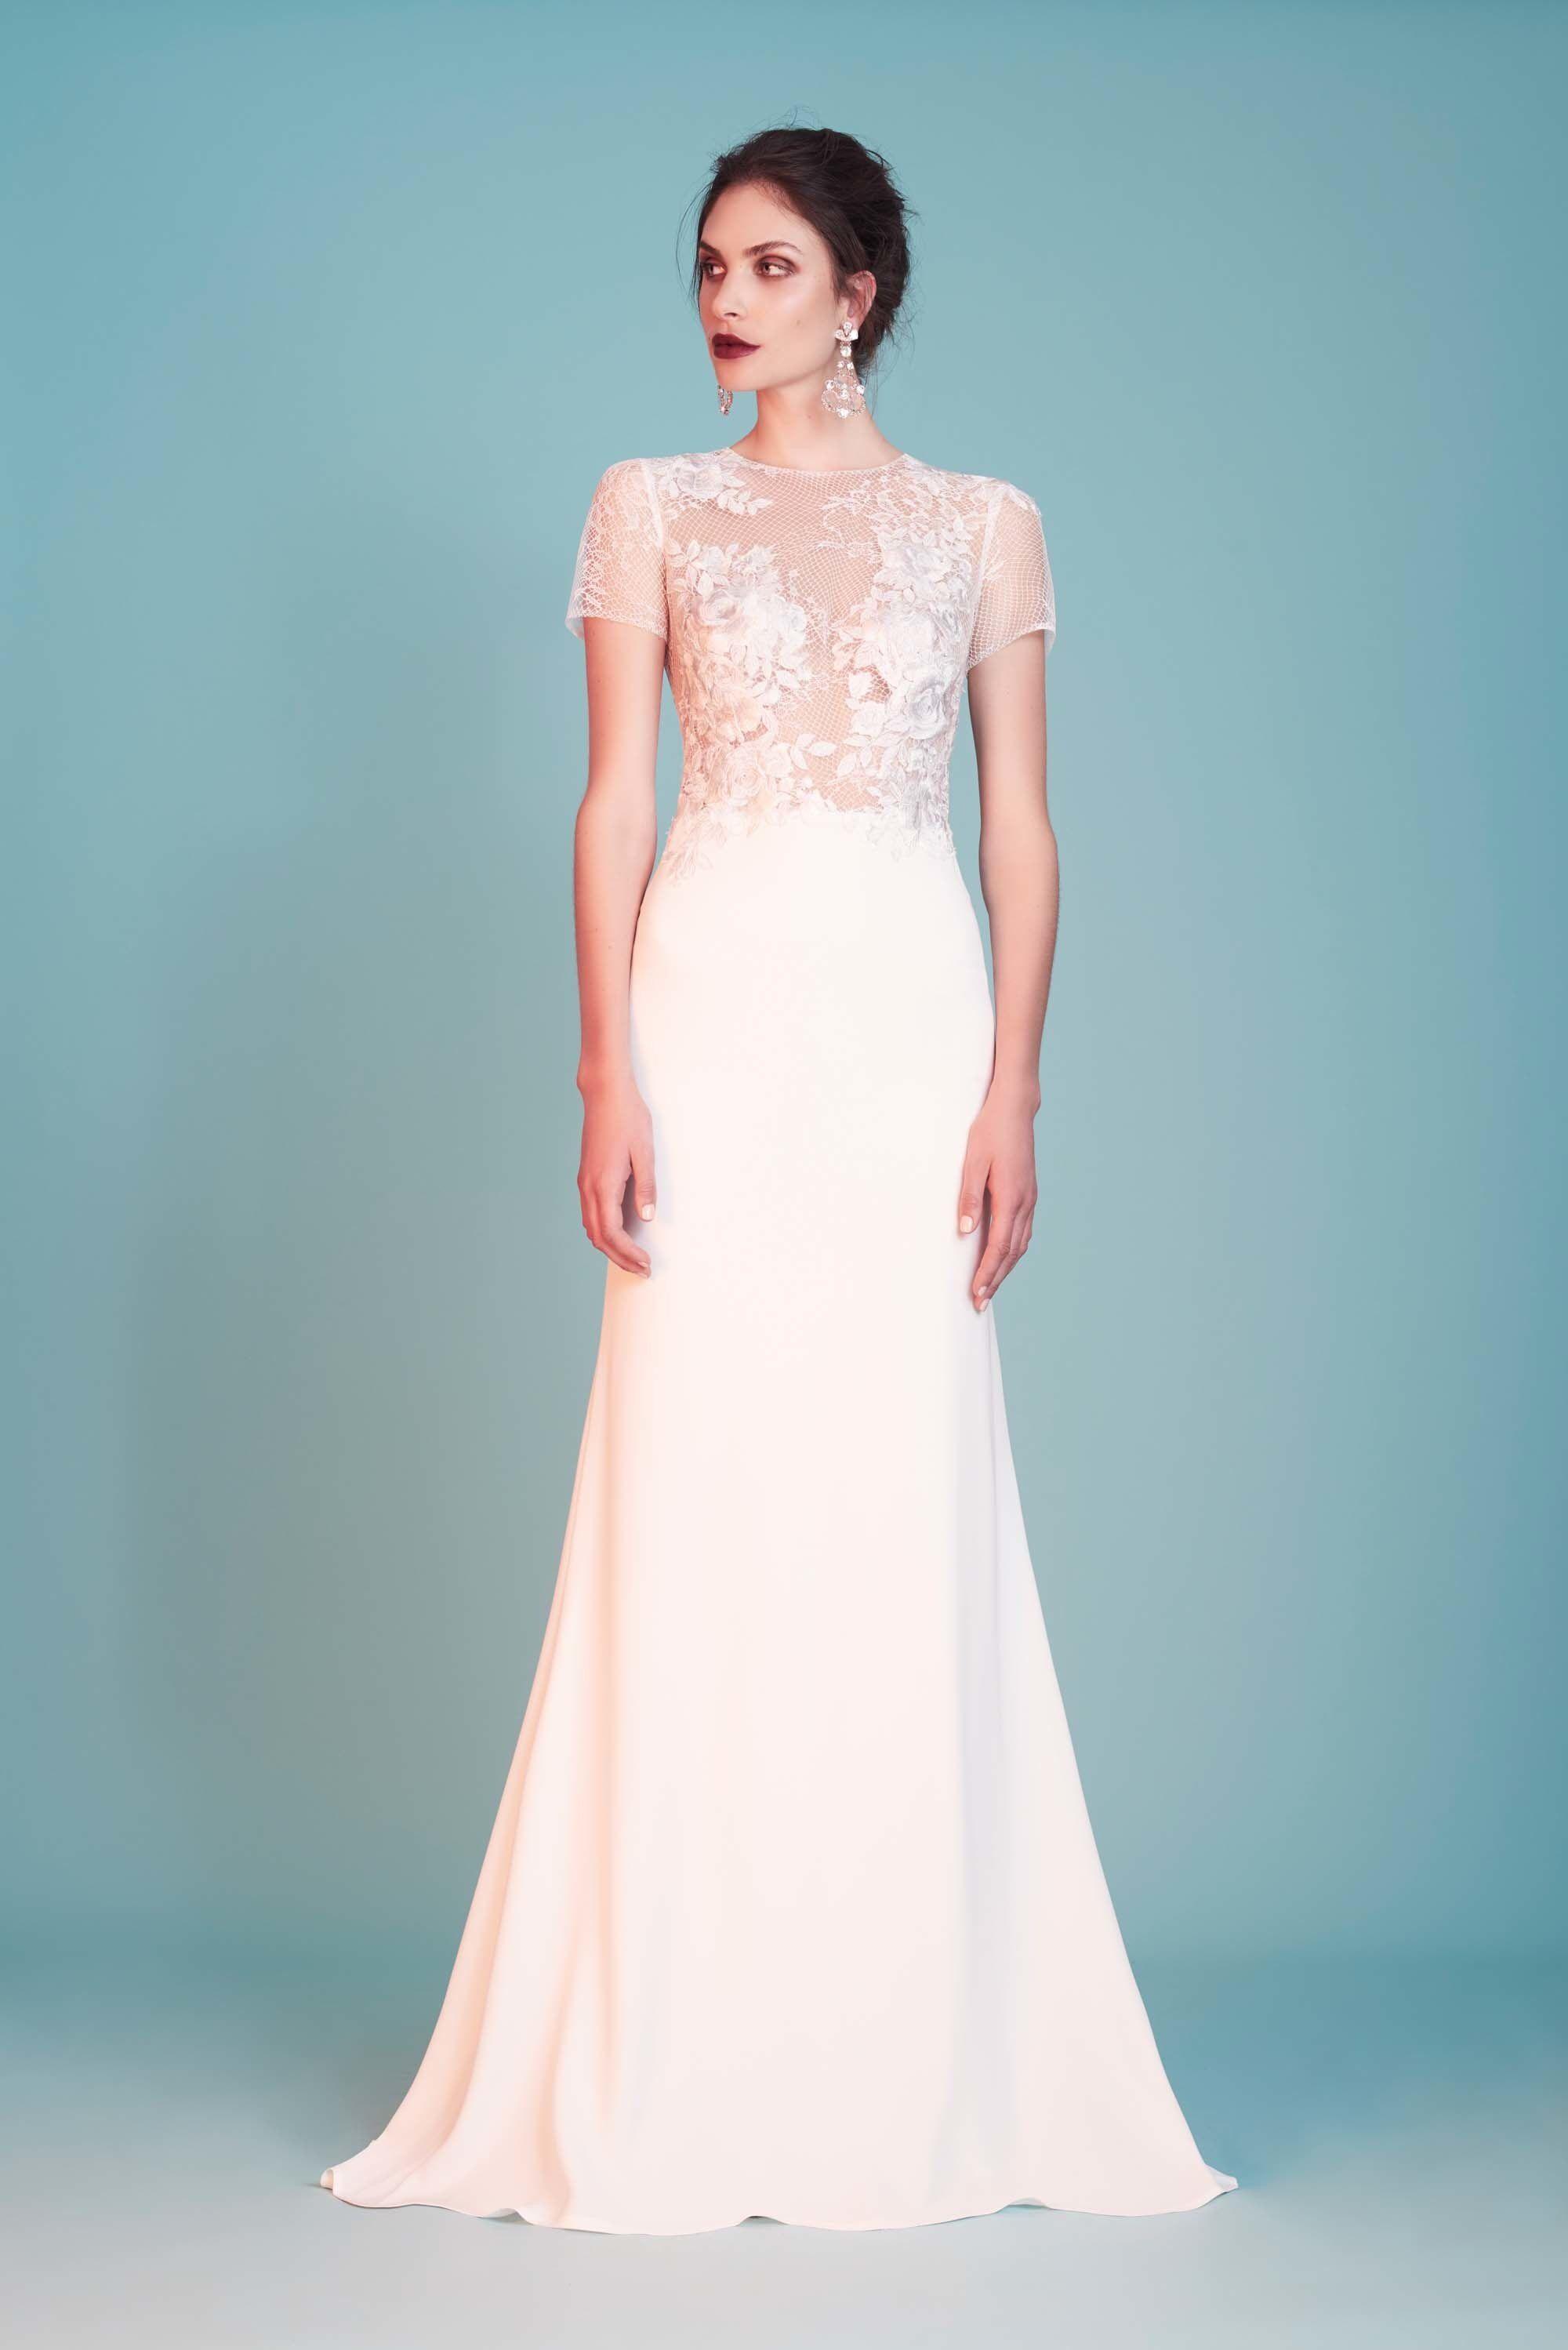 Tadashi Shoji Bridal Spring 2018 Fashion Show | Pinterest | Vestidos ...